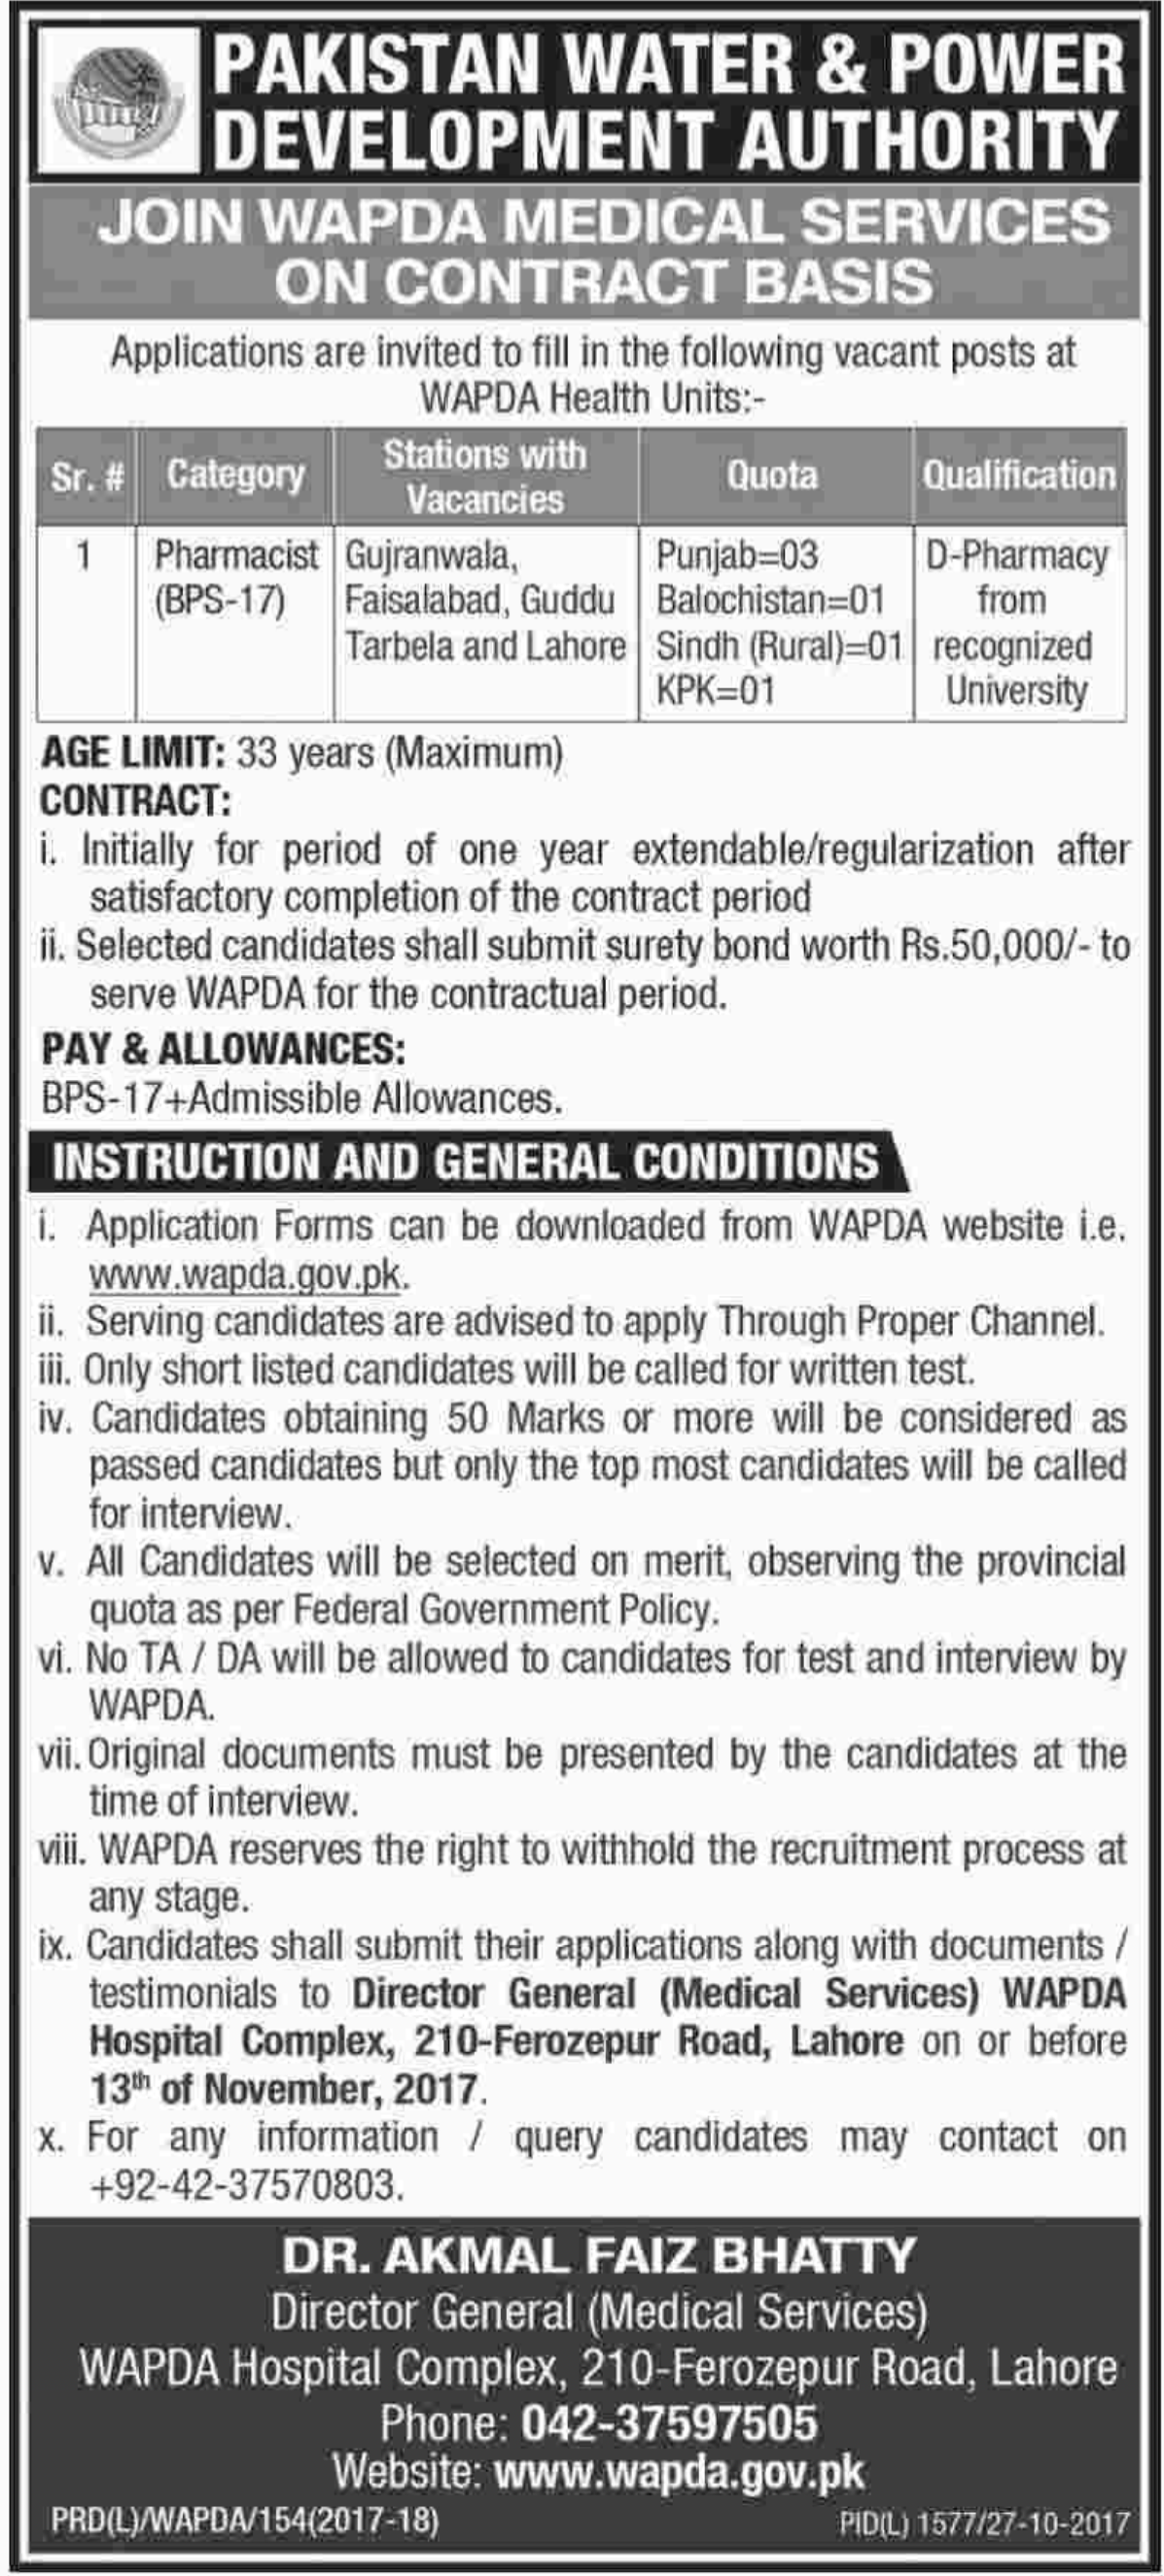 WAPDA Jobs Pakistan Water & Power Development Authority